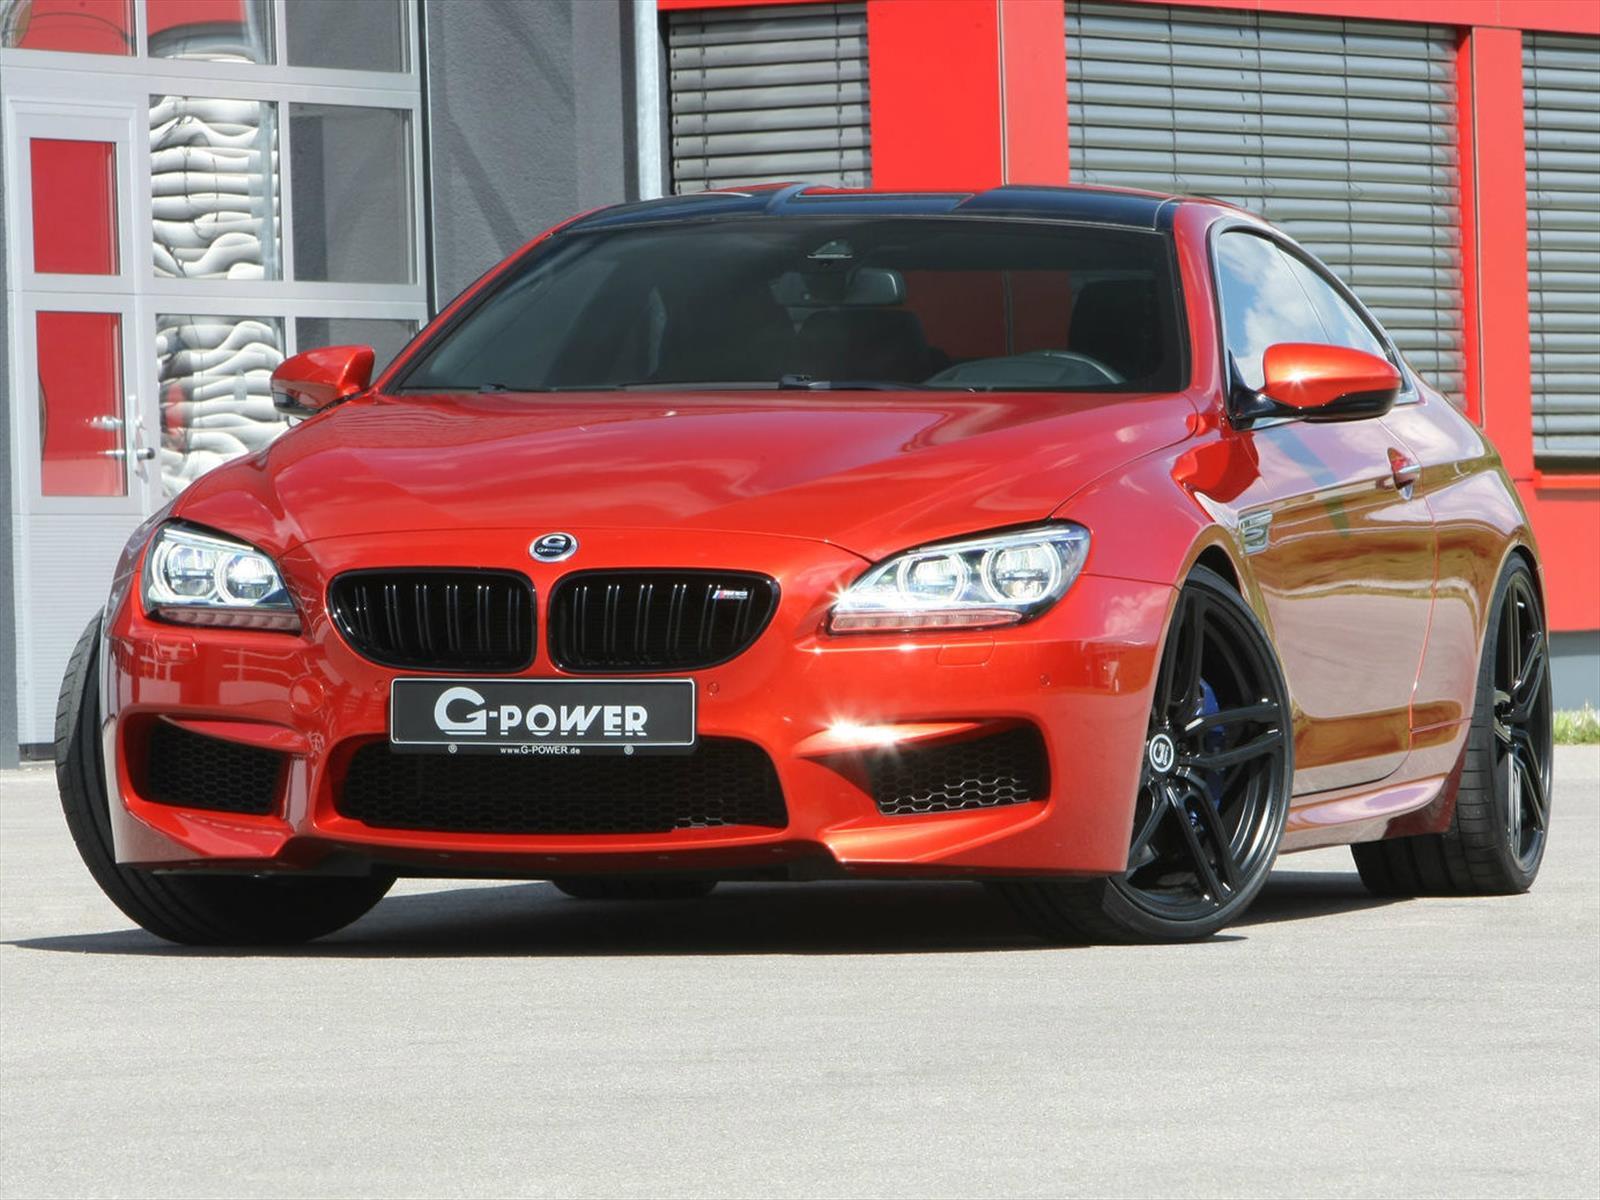 BMW M6 Coupe por G-Power, un Gran Turismo fortalecido